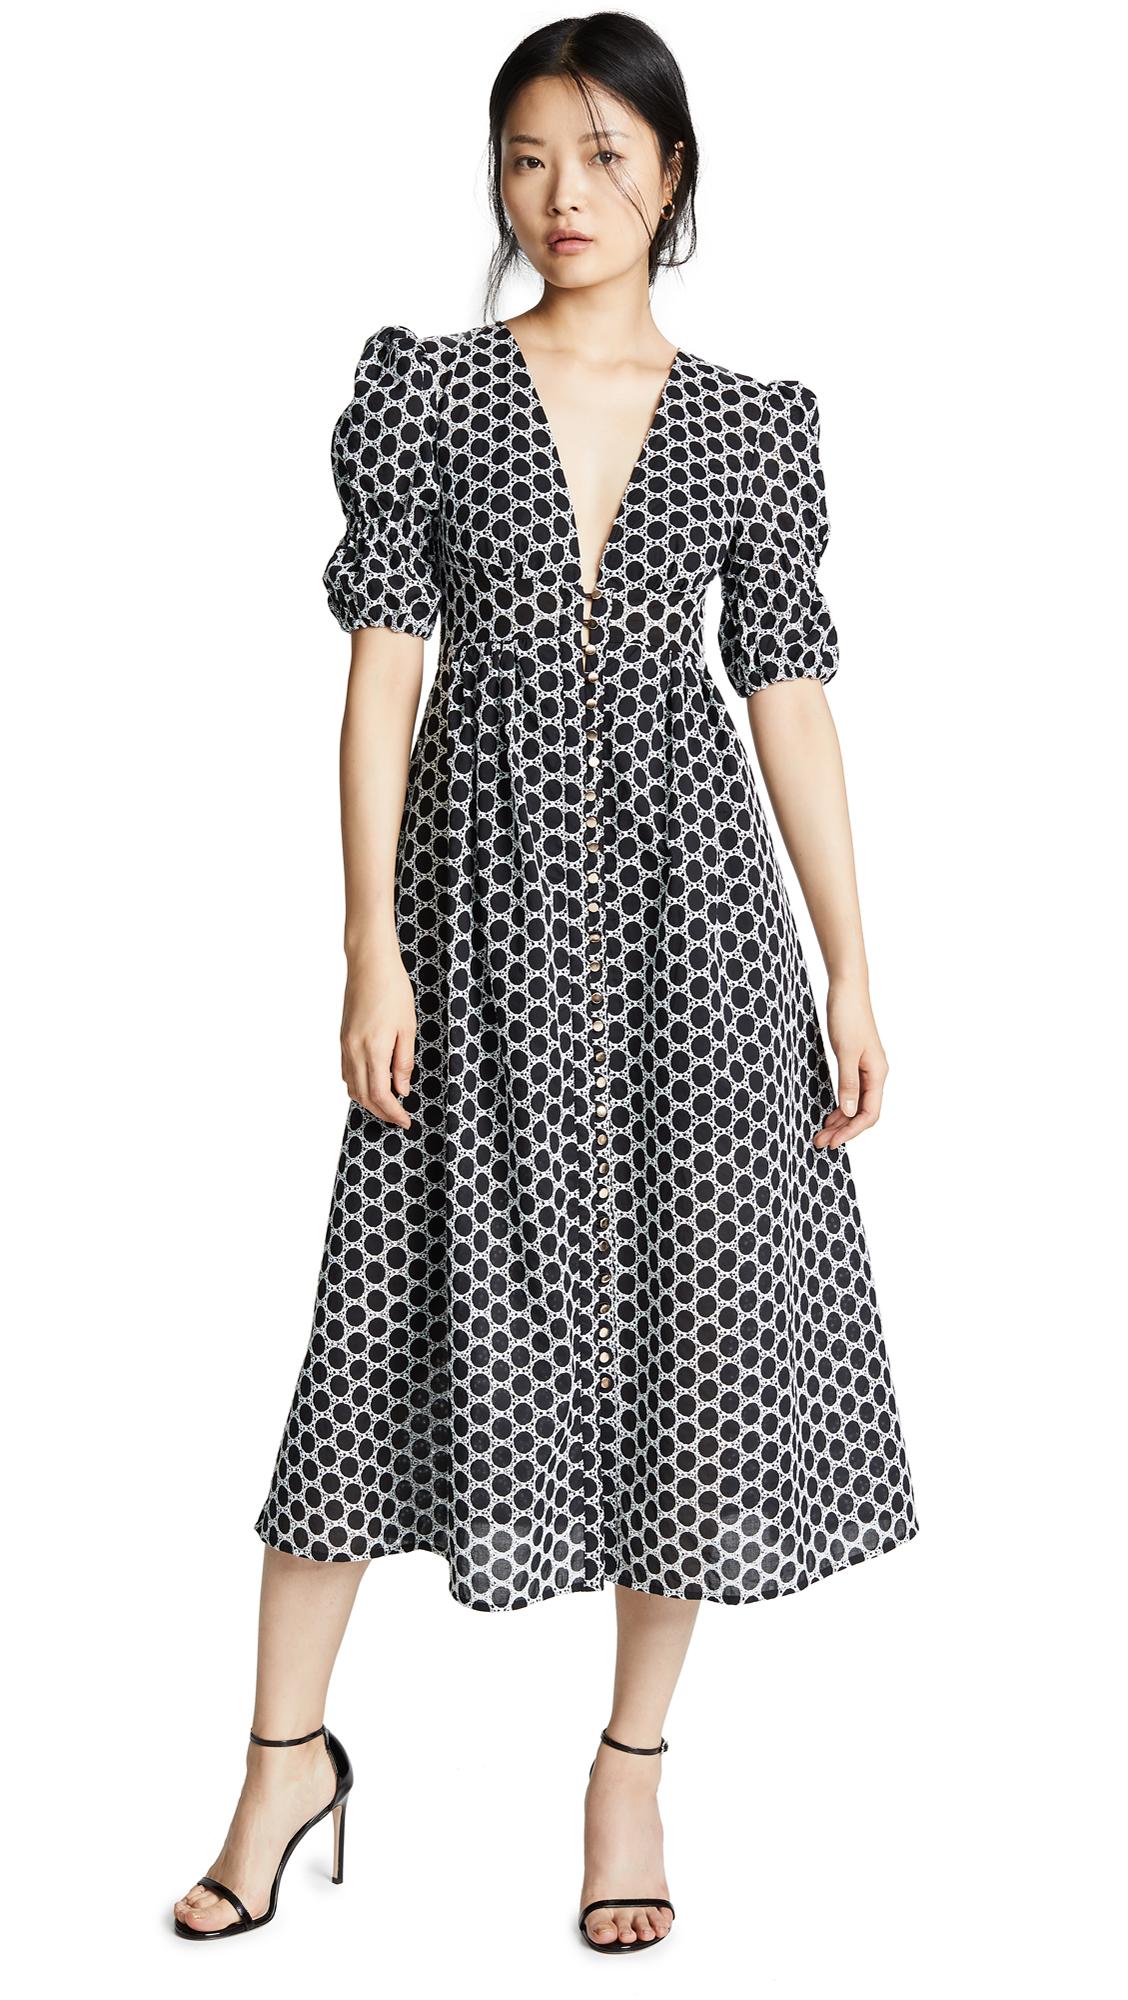 Keepsake Belong Midi Dress - Black With Ivory Polka Dot